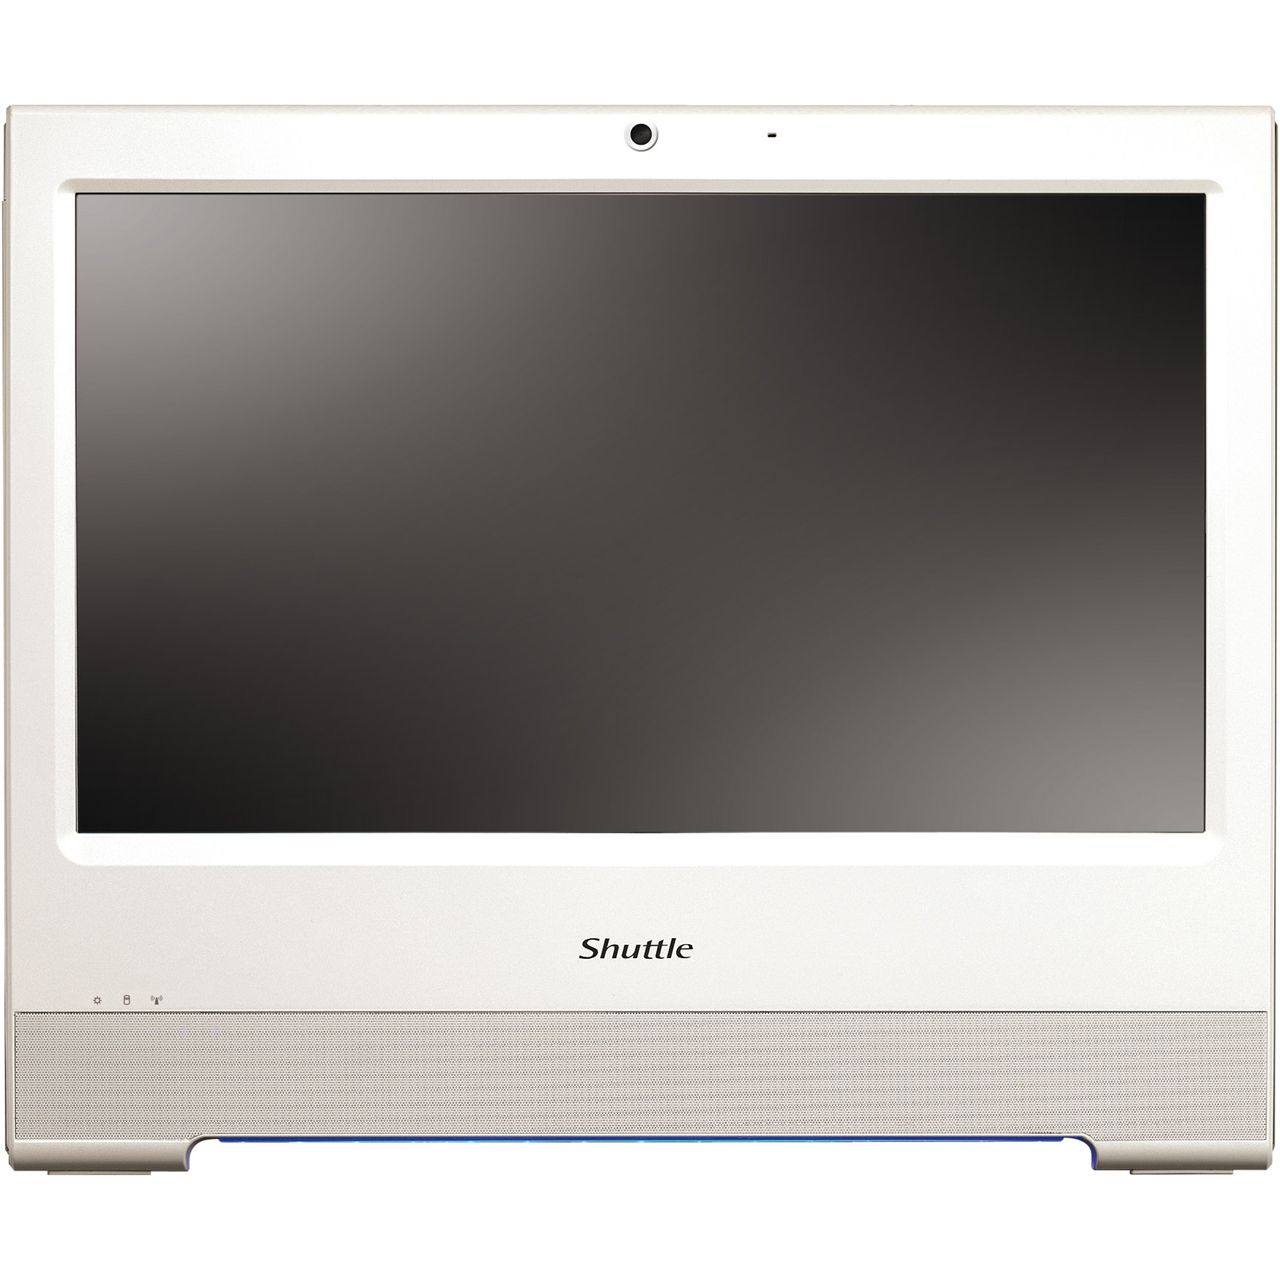 15-6-39-62cm-Shuttle-X5020VA-Plus-Touch-PAV-X502PVA1-All-in-One-PC